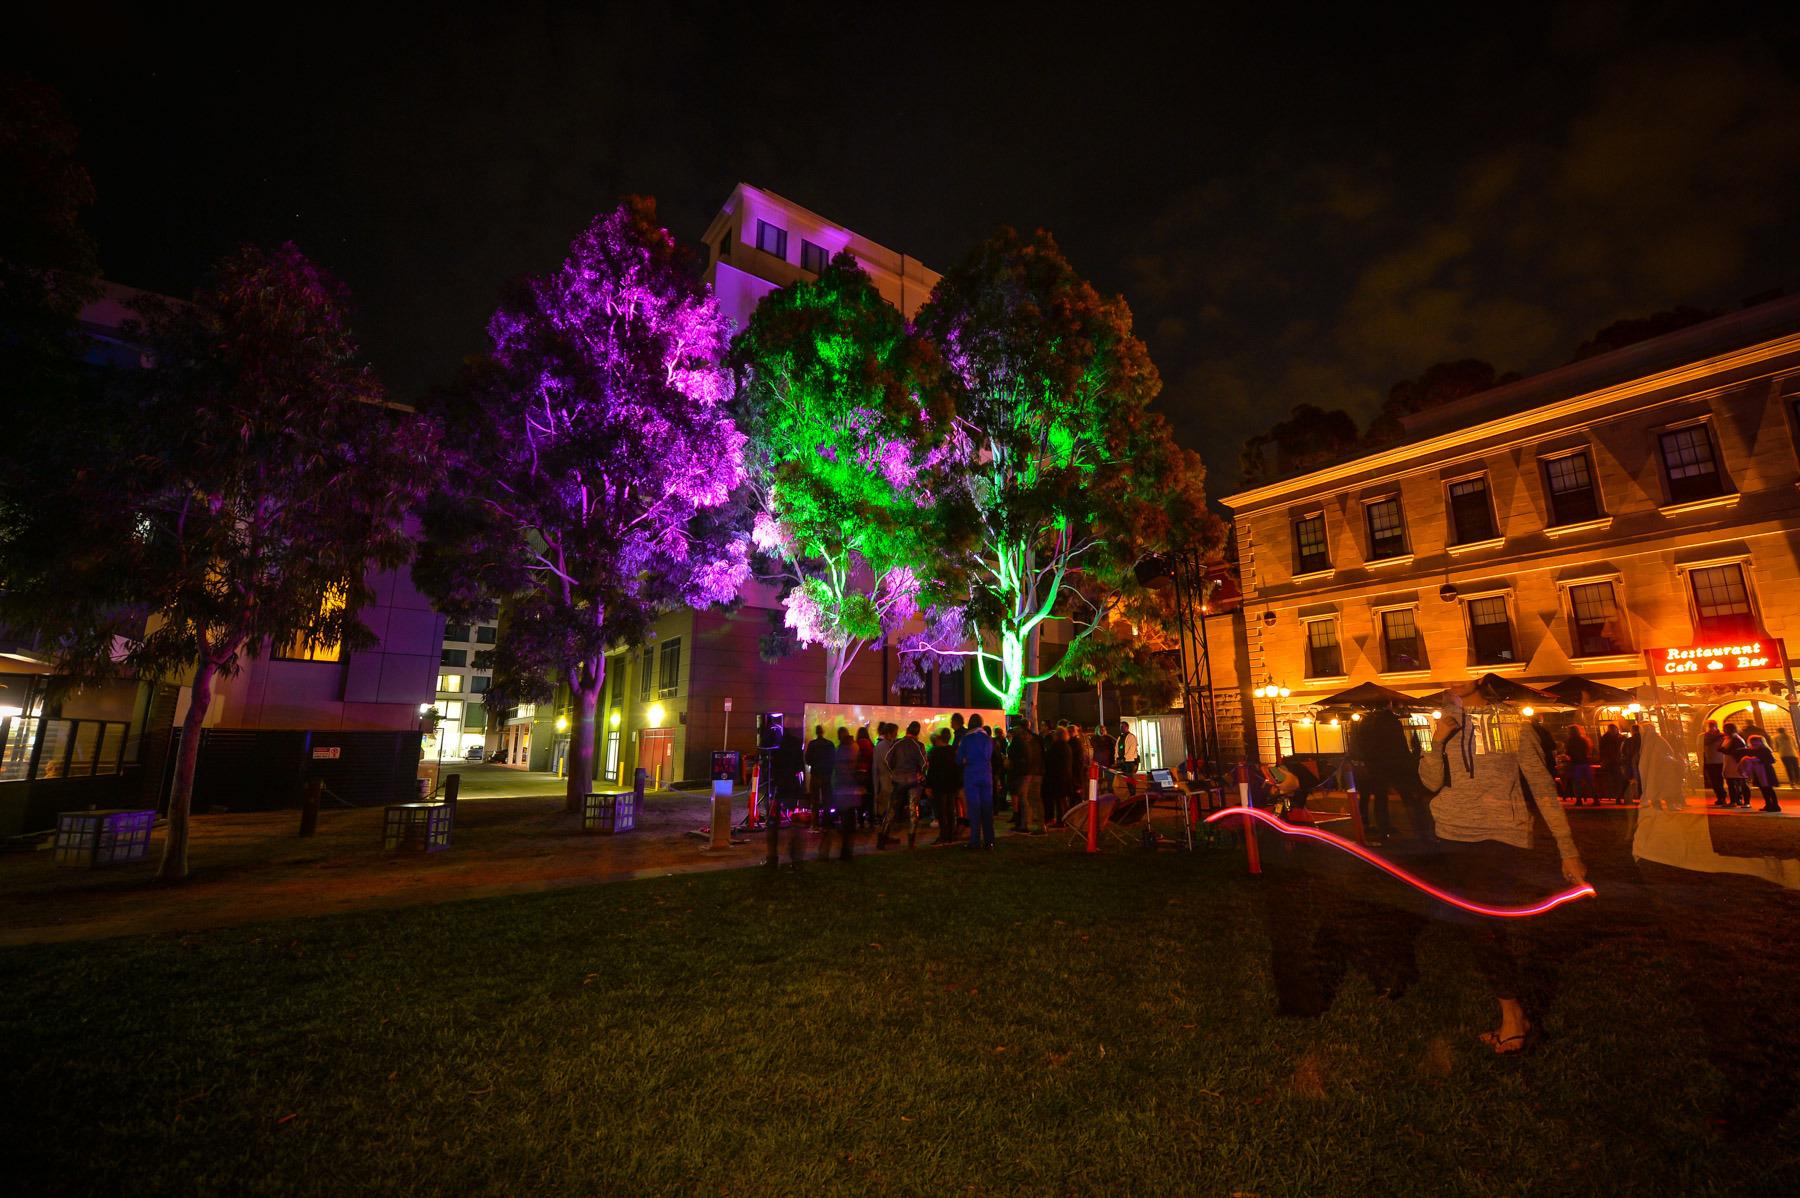 Luminance Lab: Telekinetic. Photograph by Reg Ryan.